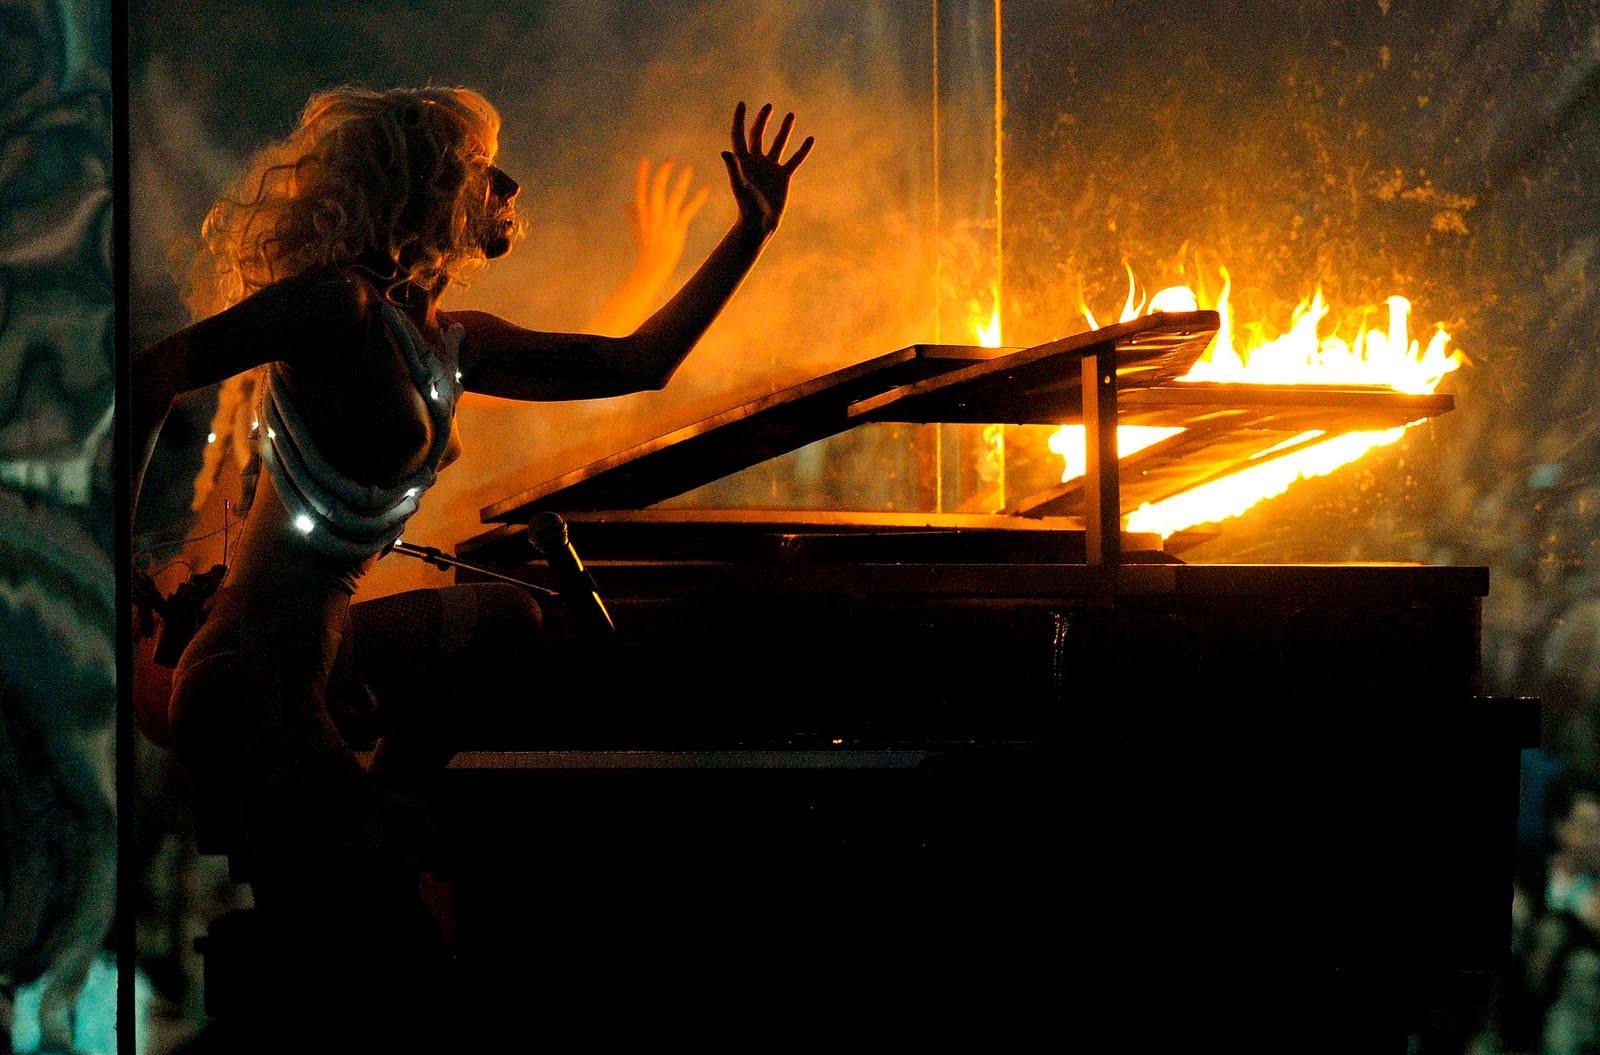 lady gaga – fire piano